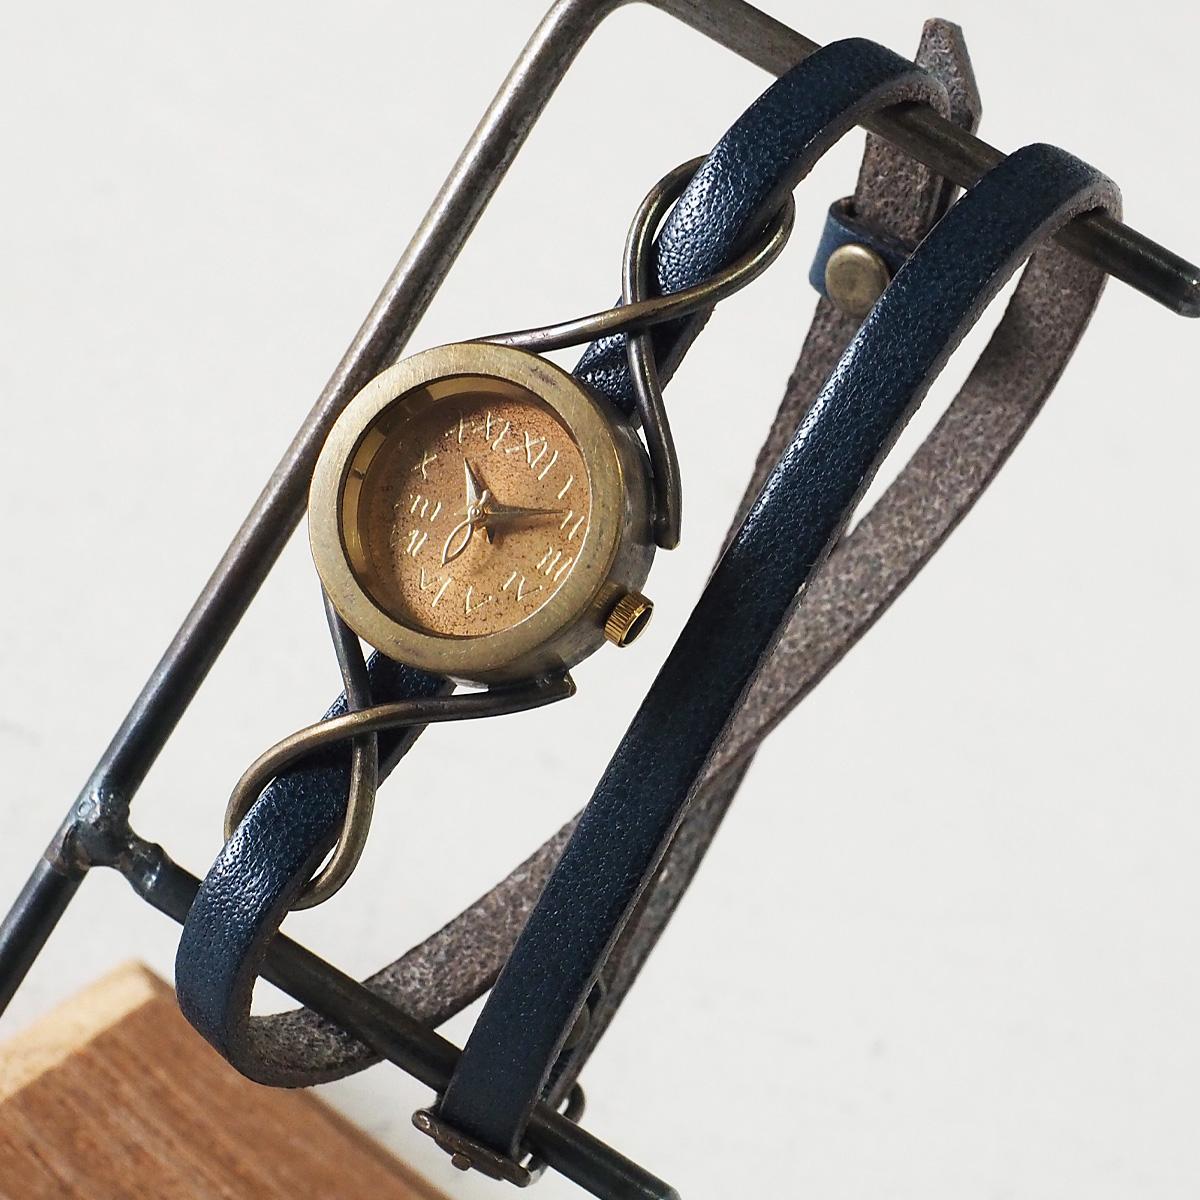 "vie(ヴィー) 手作り腕時計 ""nostalgie -ノスタルジー-"" 2重ベルト レディース [WB-068-W-BELT]"